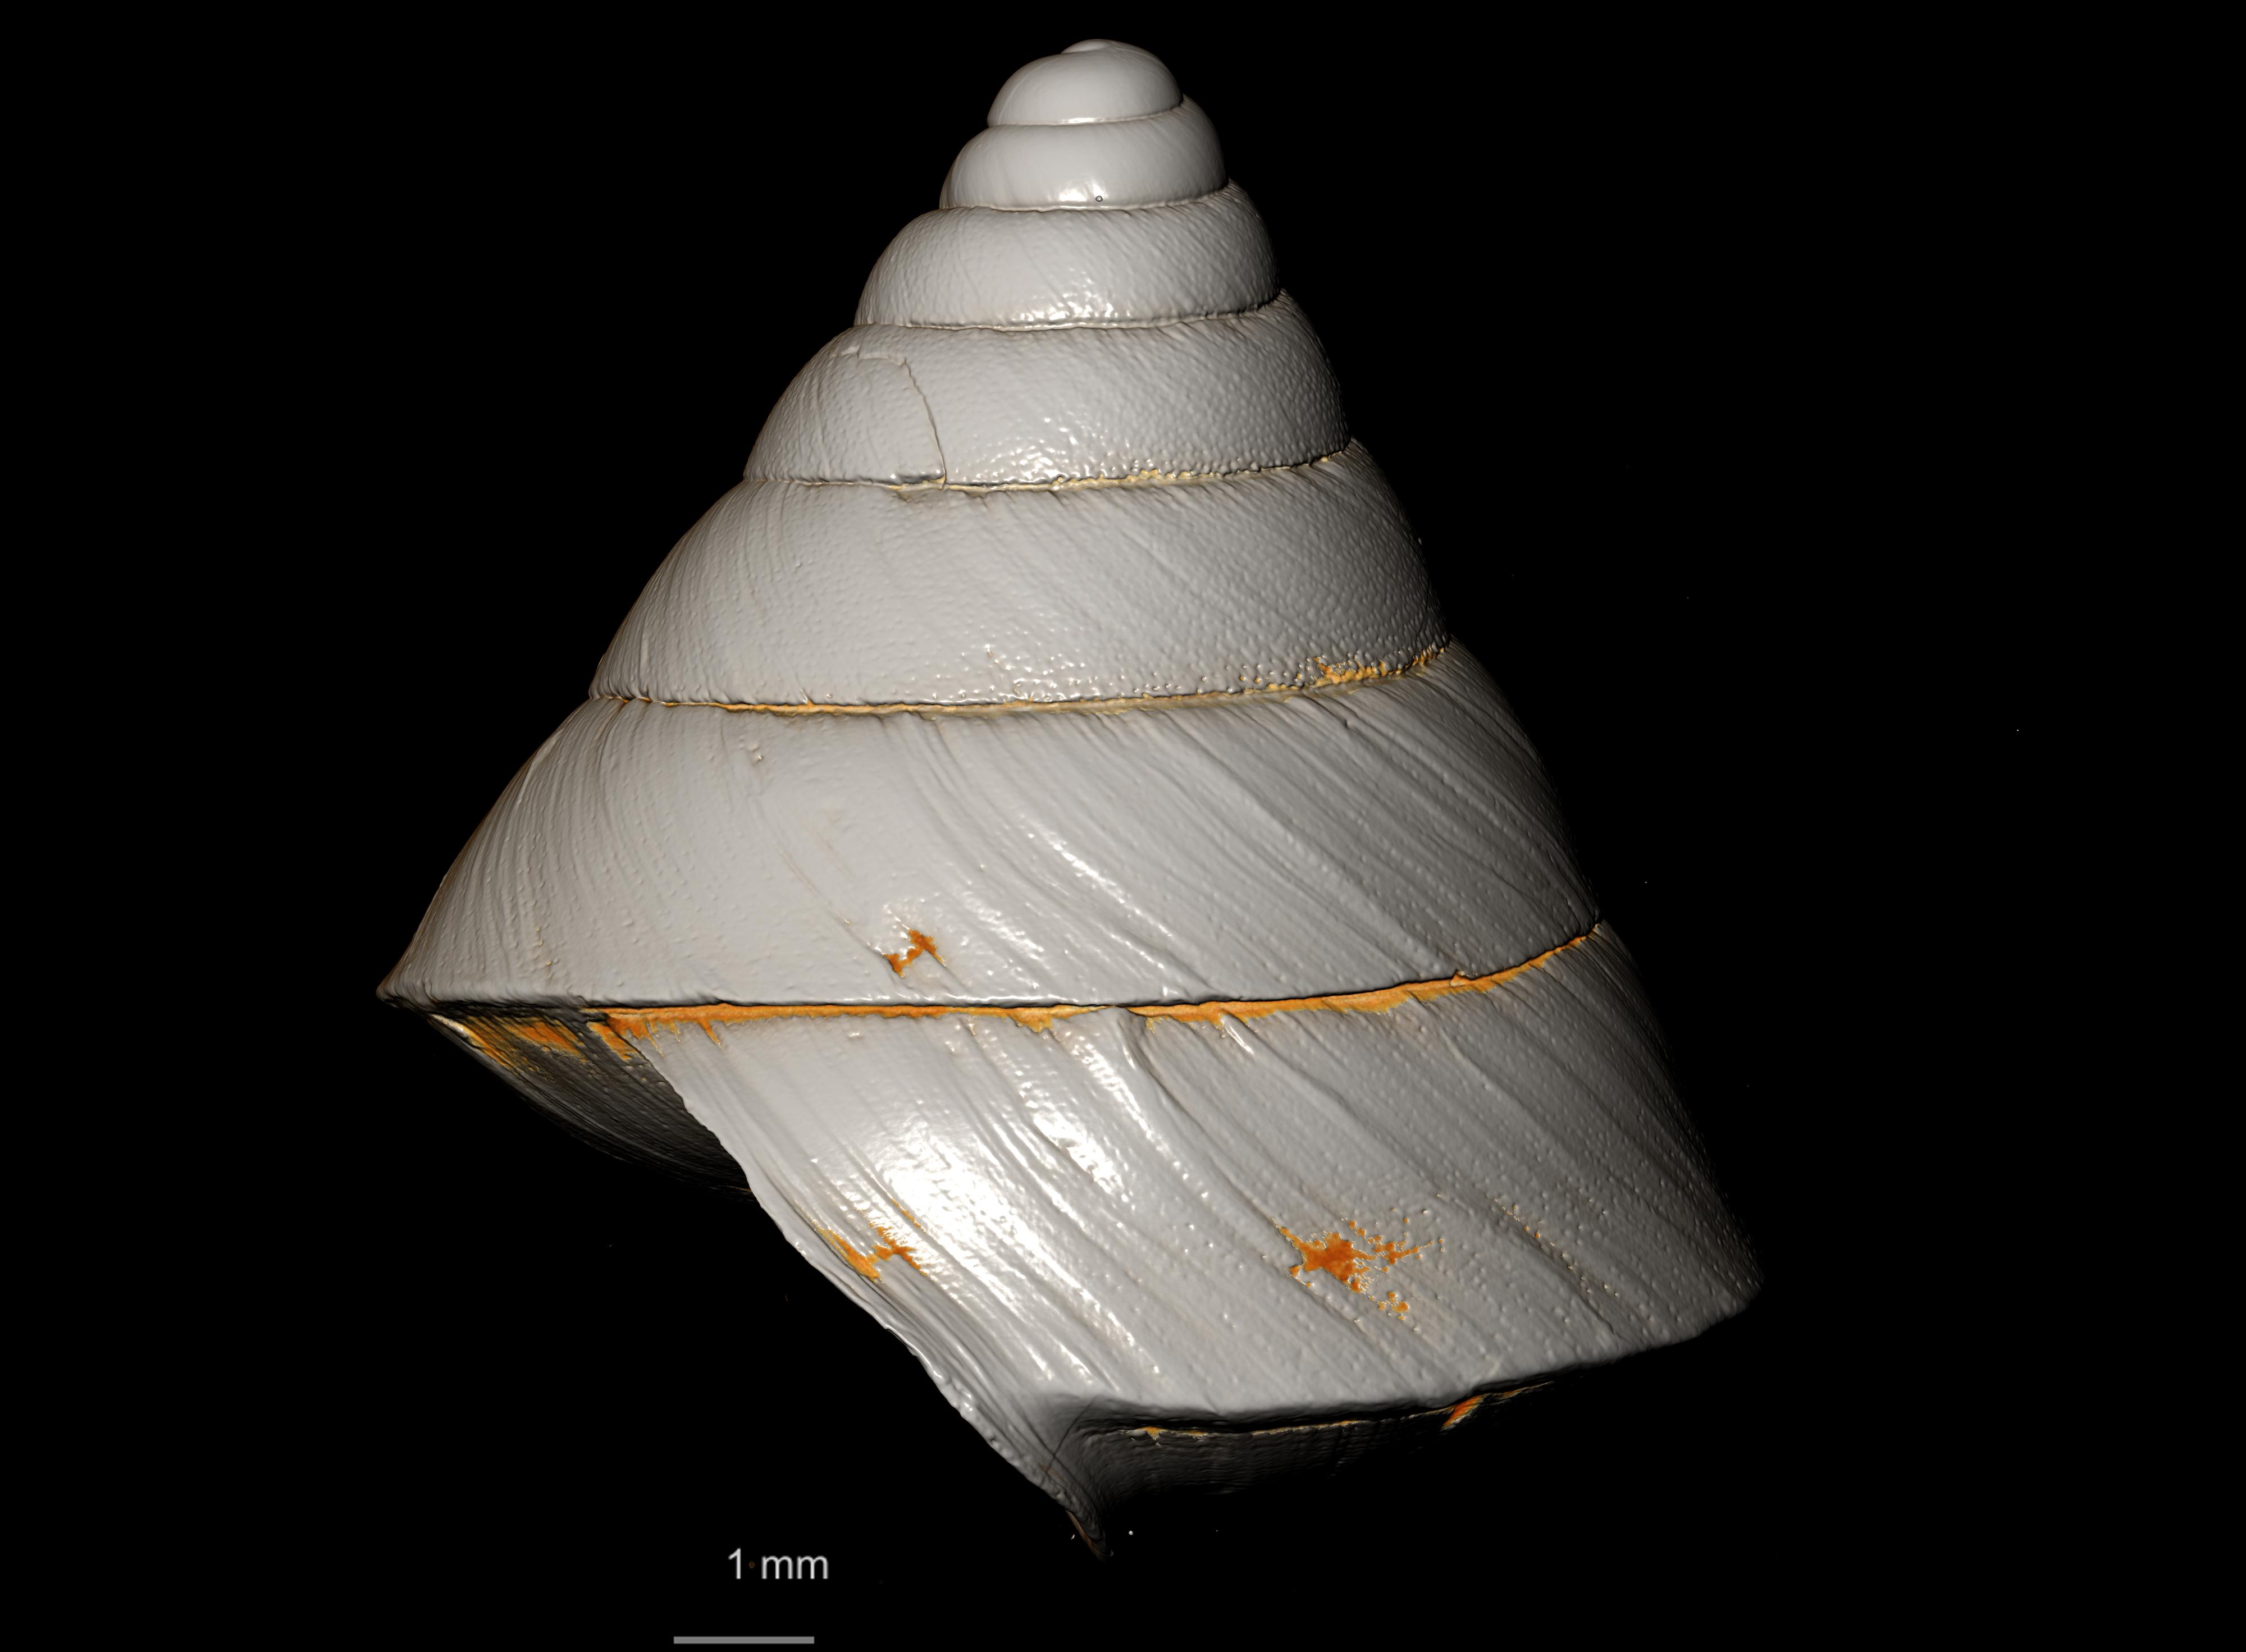 BE-RBINS-INV-TYPES-MT-2467-Helix-acris-albina-MCT-XRE-PROFILE-2.jpg